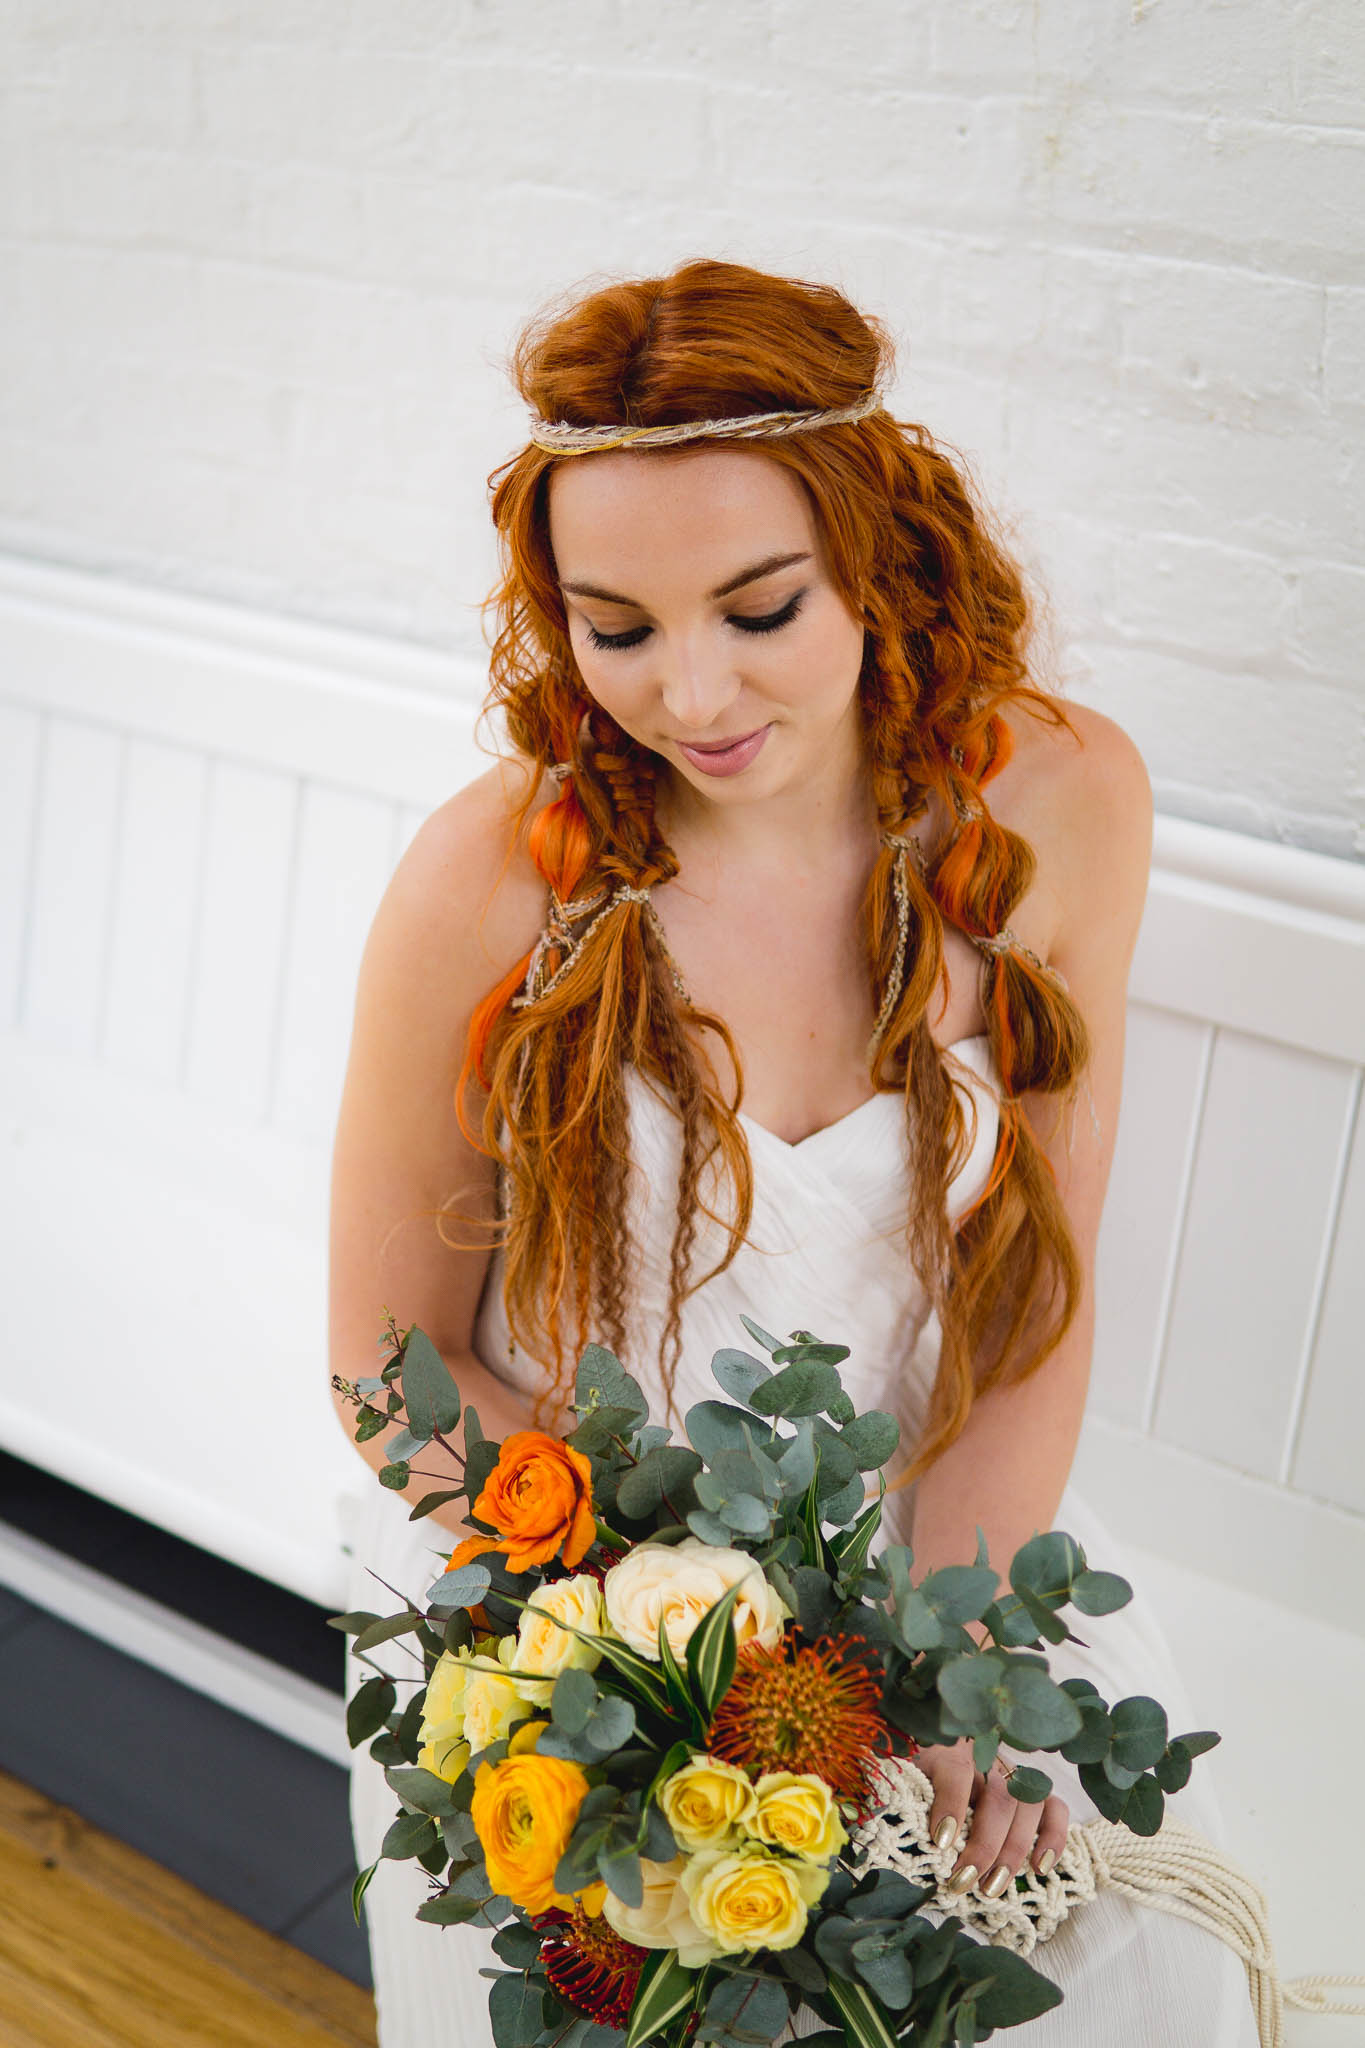 The_Conscious_Bride_Heline_Bekker_WEB_280.jpg